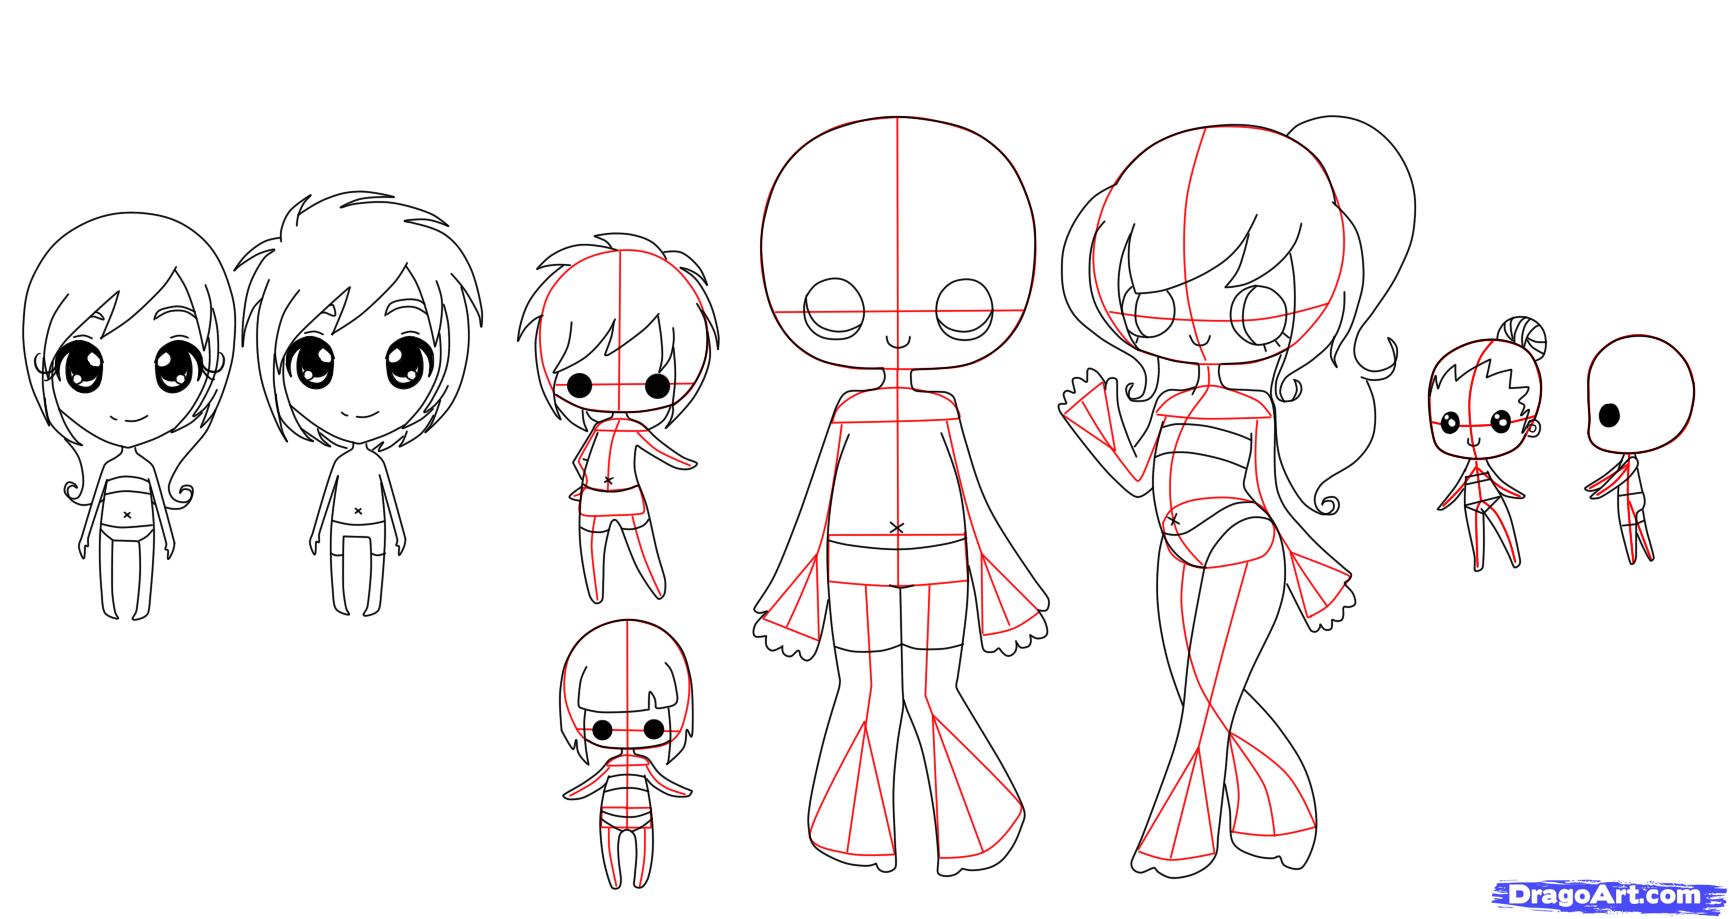 How To Draw Chibi Bodies Step By Step Chibis Draw Chibi Anime Draw Japanese Anime Draw Manga Free Online Drawing Chibi Body Cartoon Body Chibi Drawings